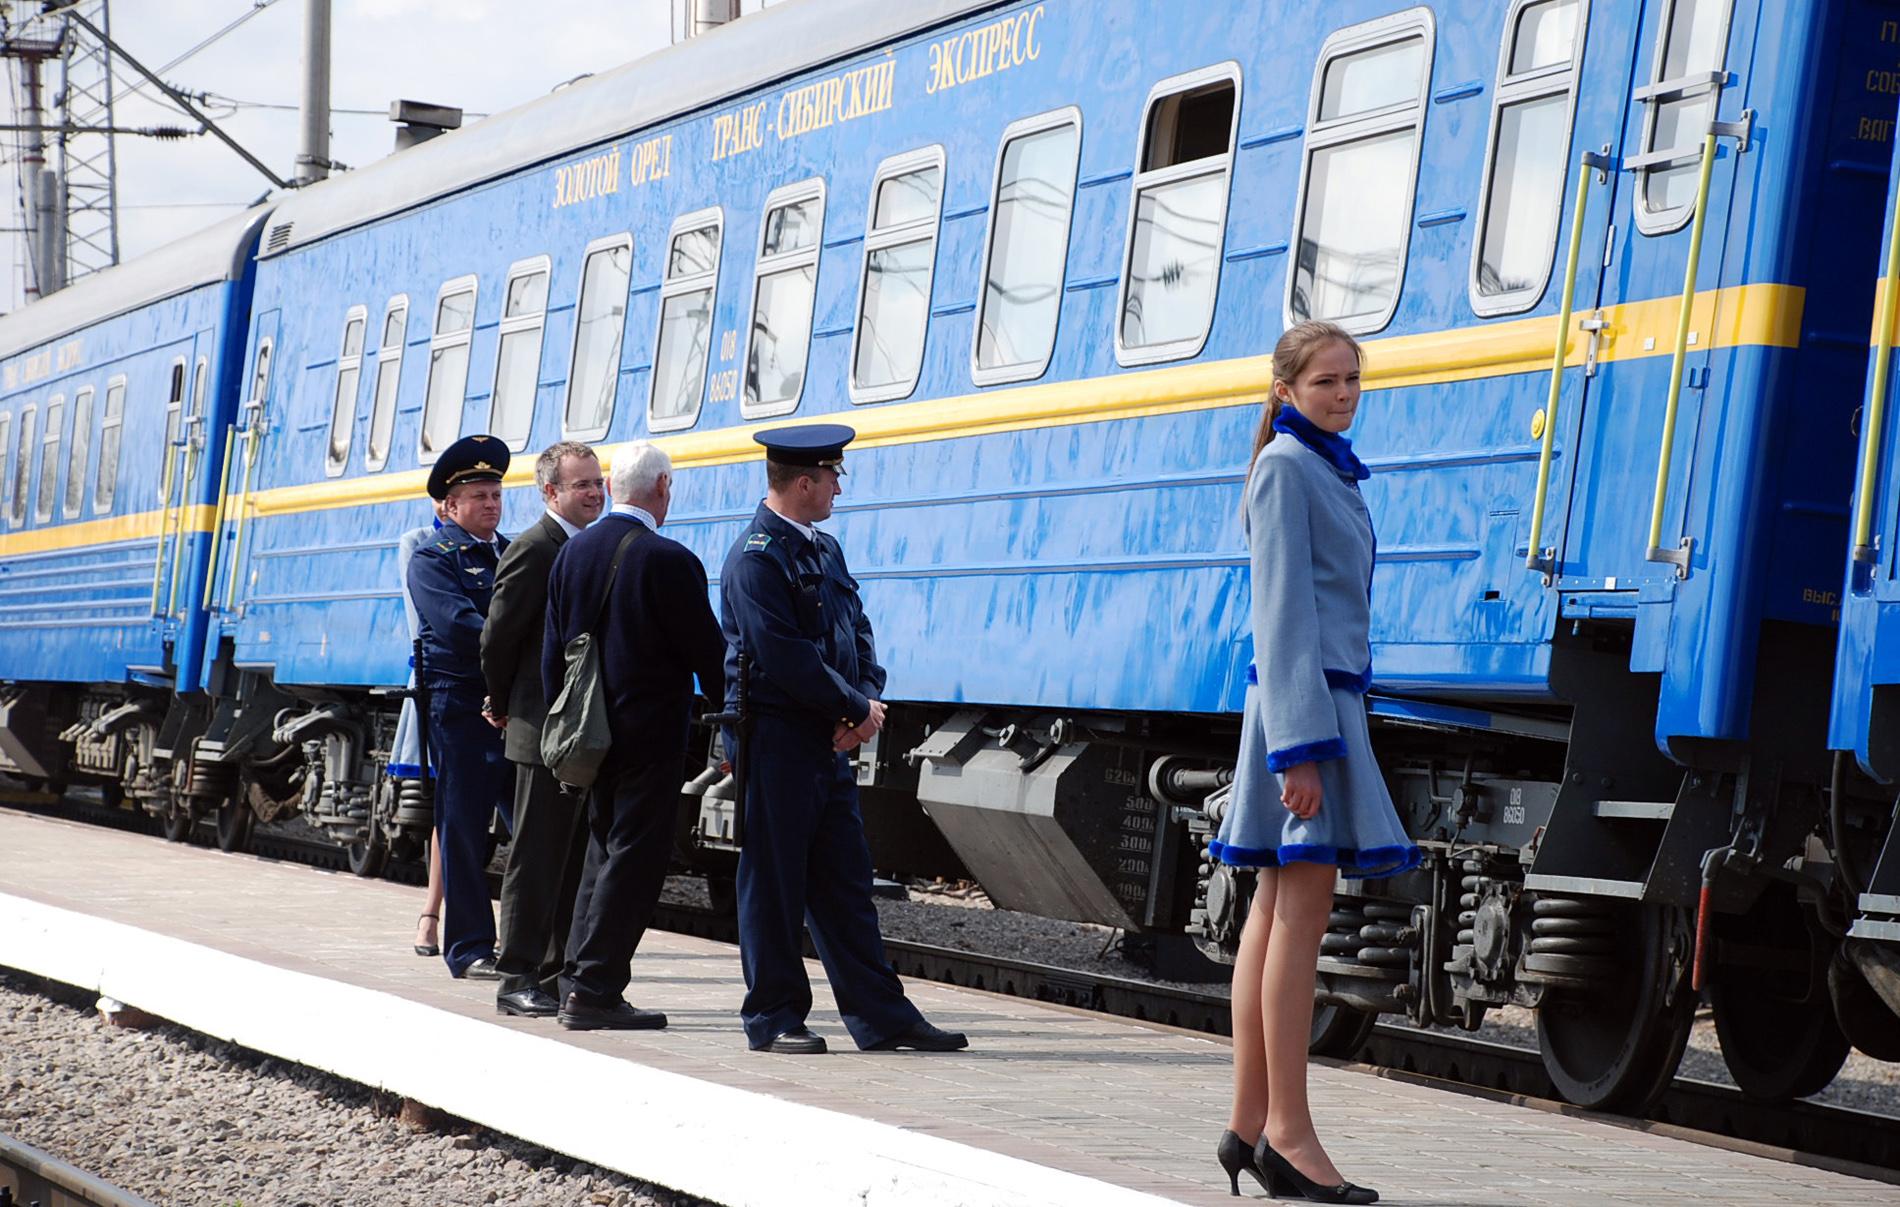 the-golden-eagle-trans-siberian-express